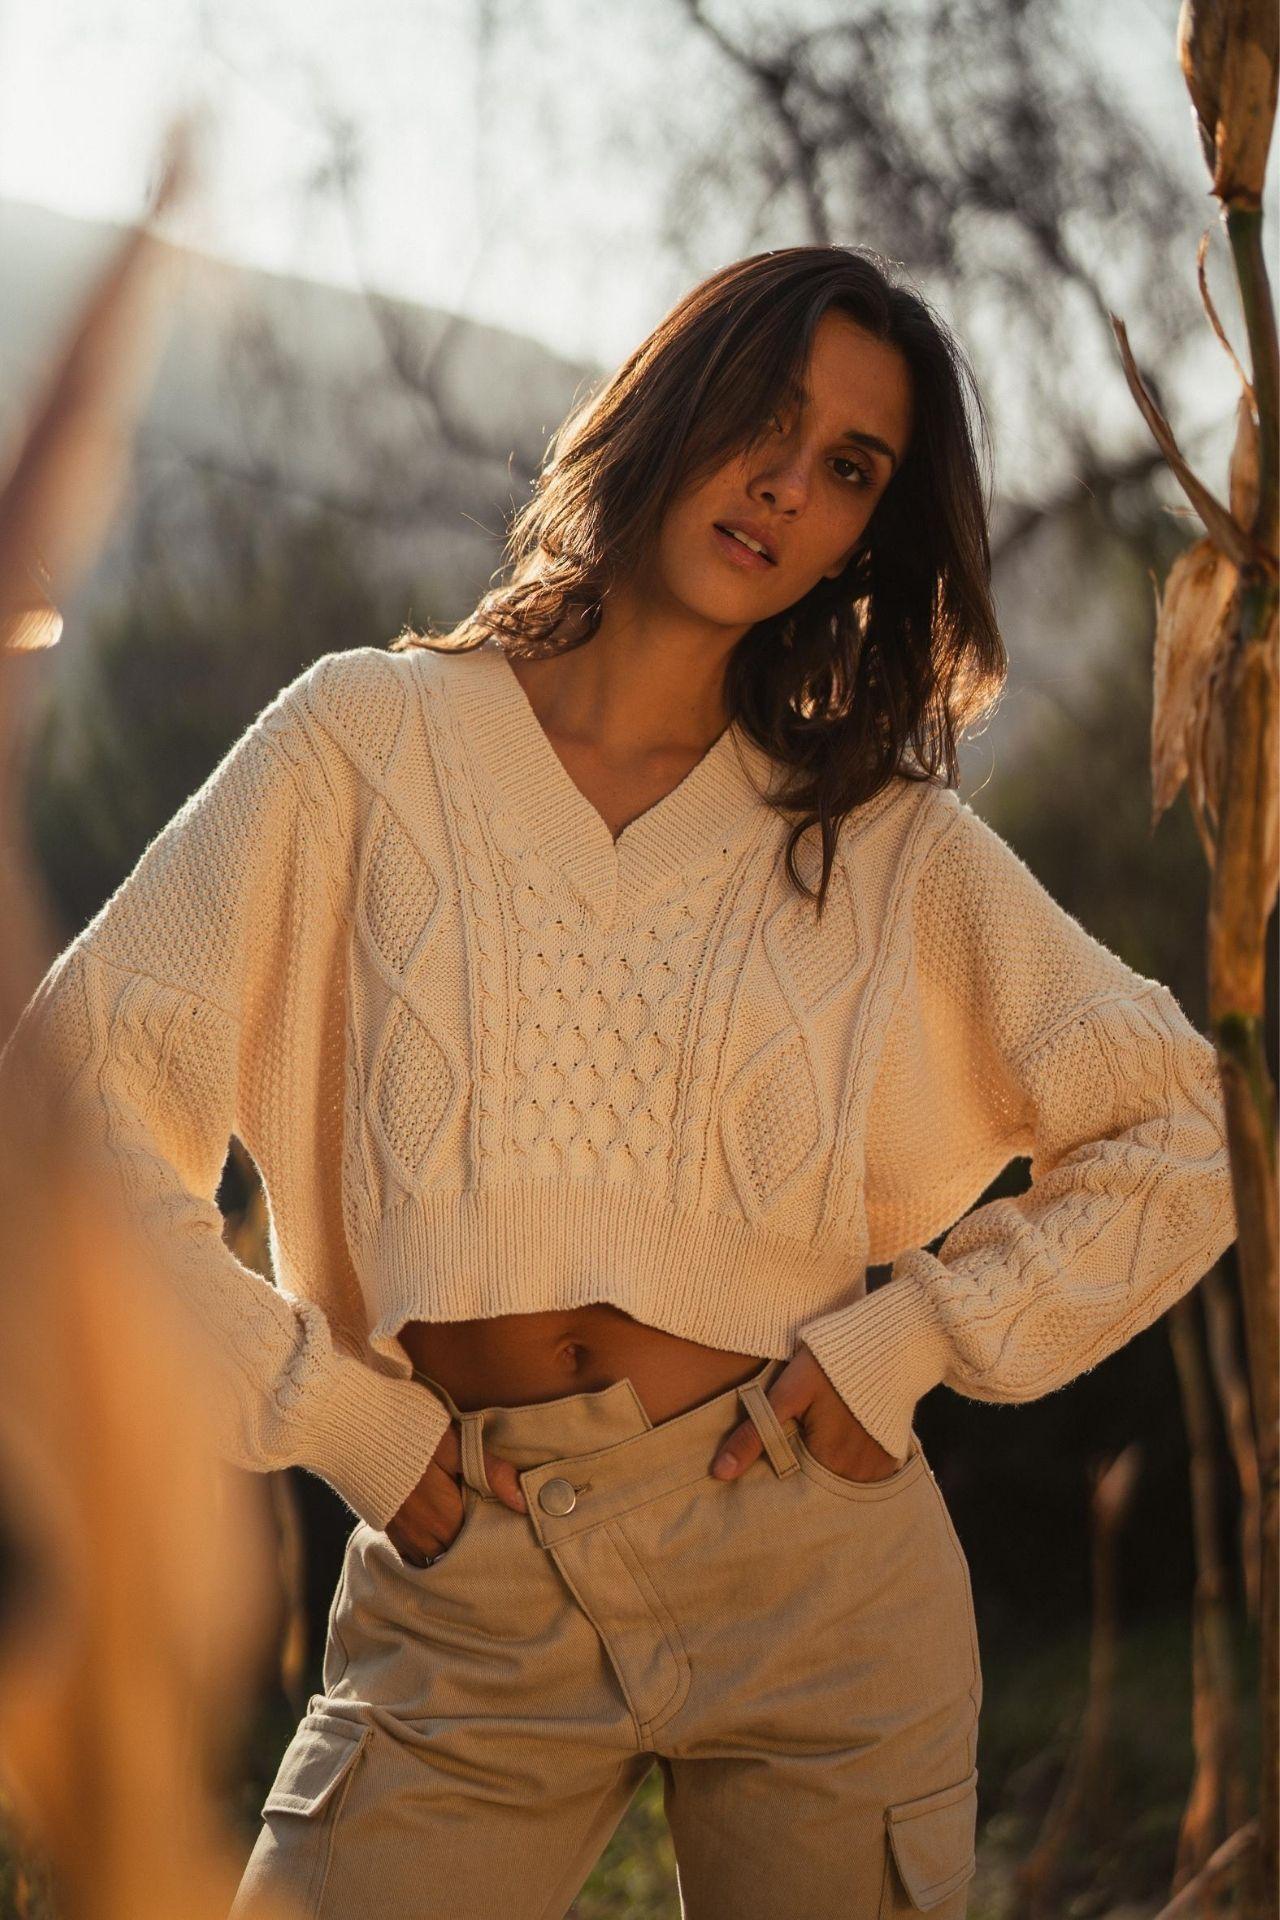 Suéter tejido con trenzas en hilo de algodón 100% tanguis peruano.  Medidas:  Busto: 136 cm  Cintura: 124 cm  Largo: 47 cm  Largo manga (hombro-manga): 71 cm